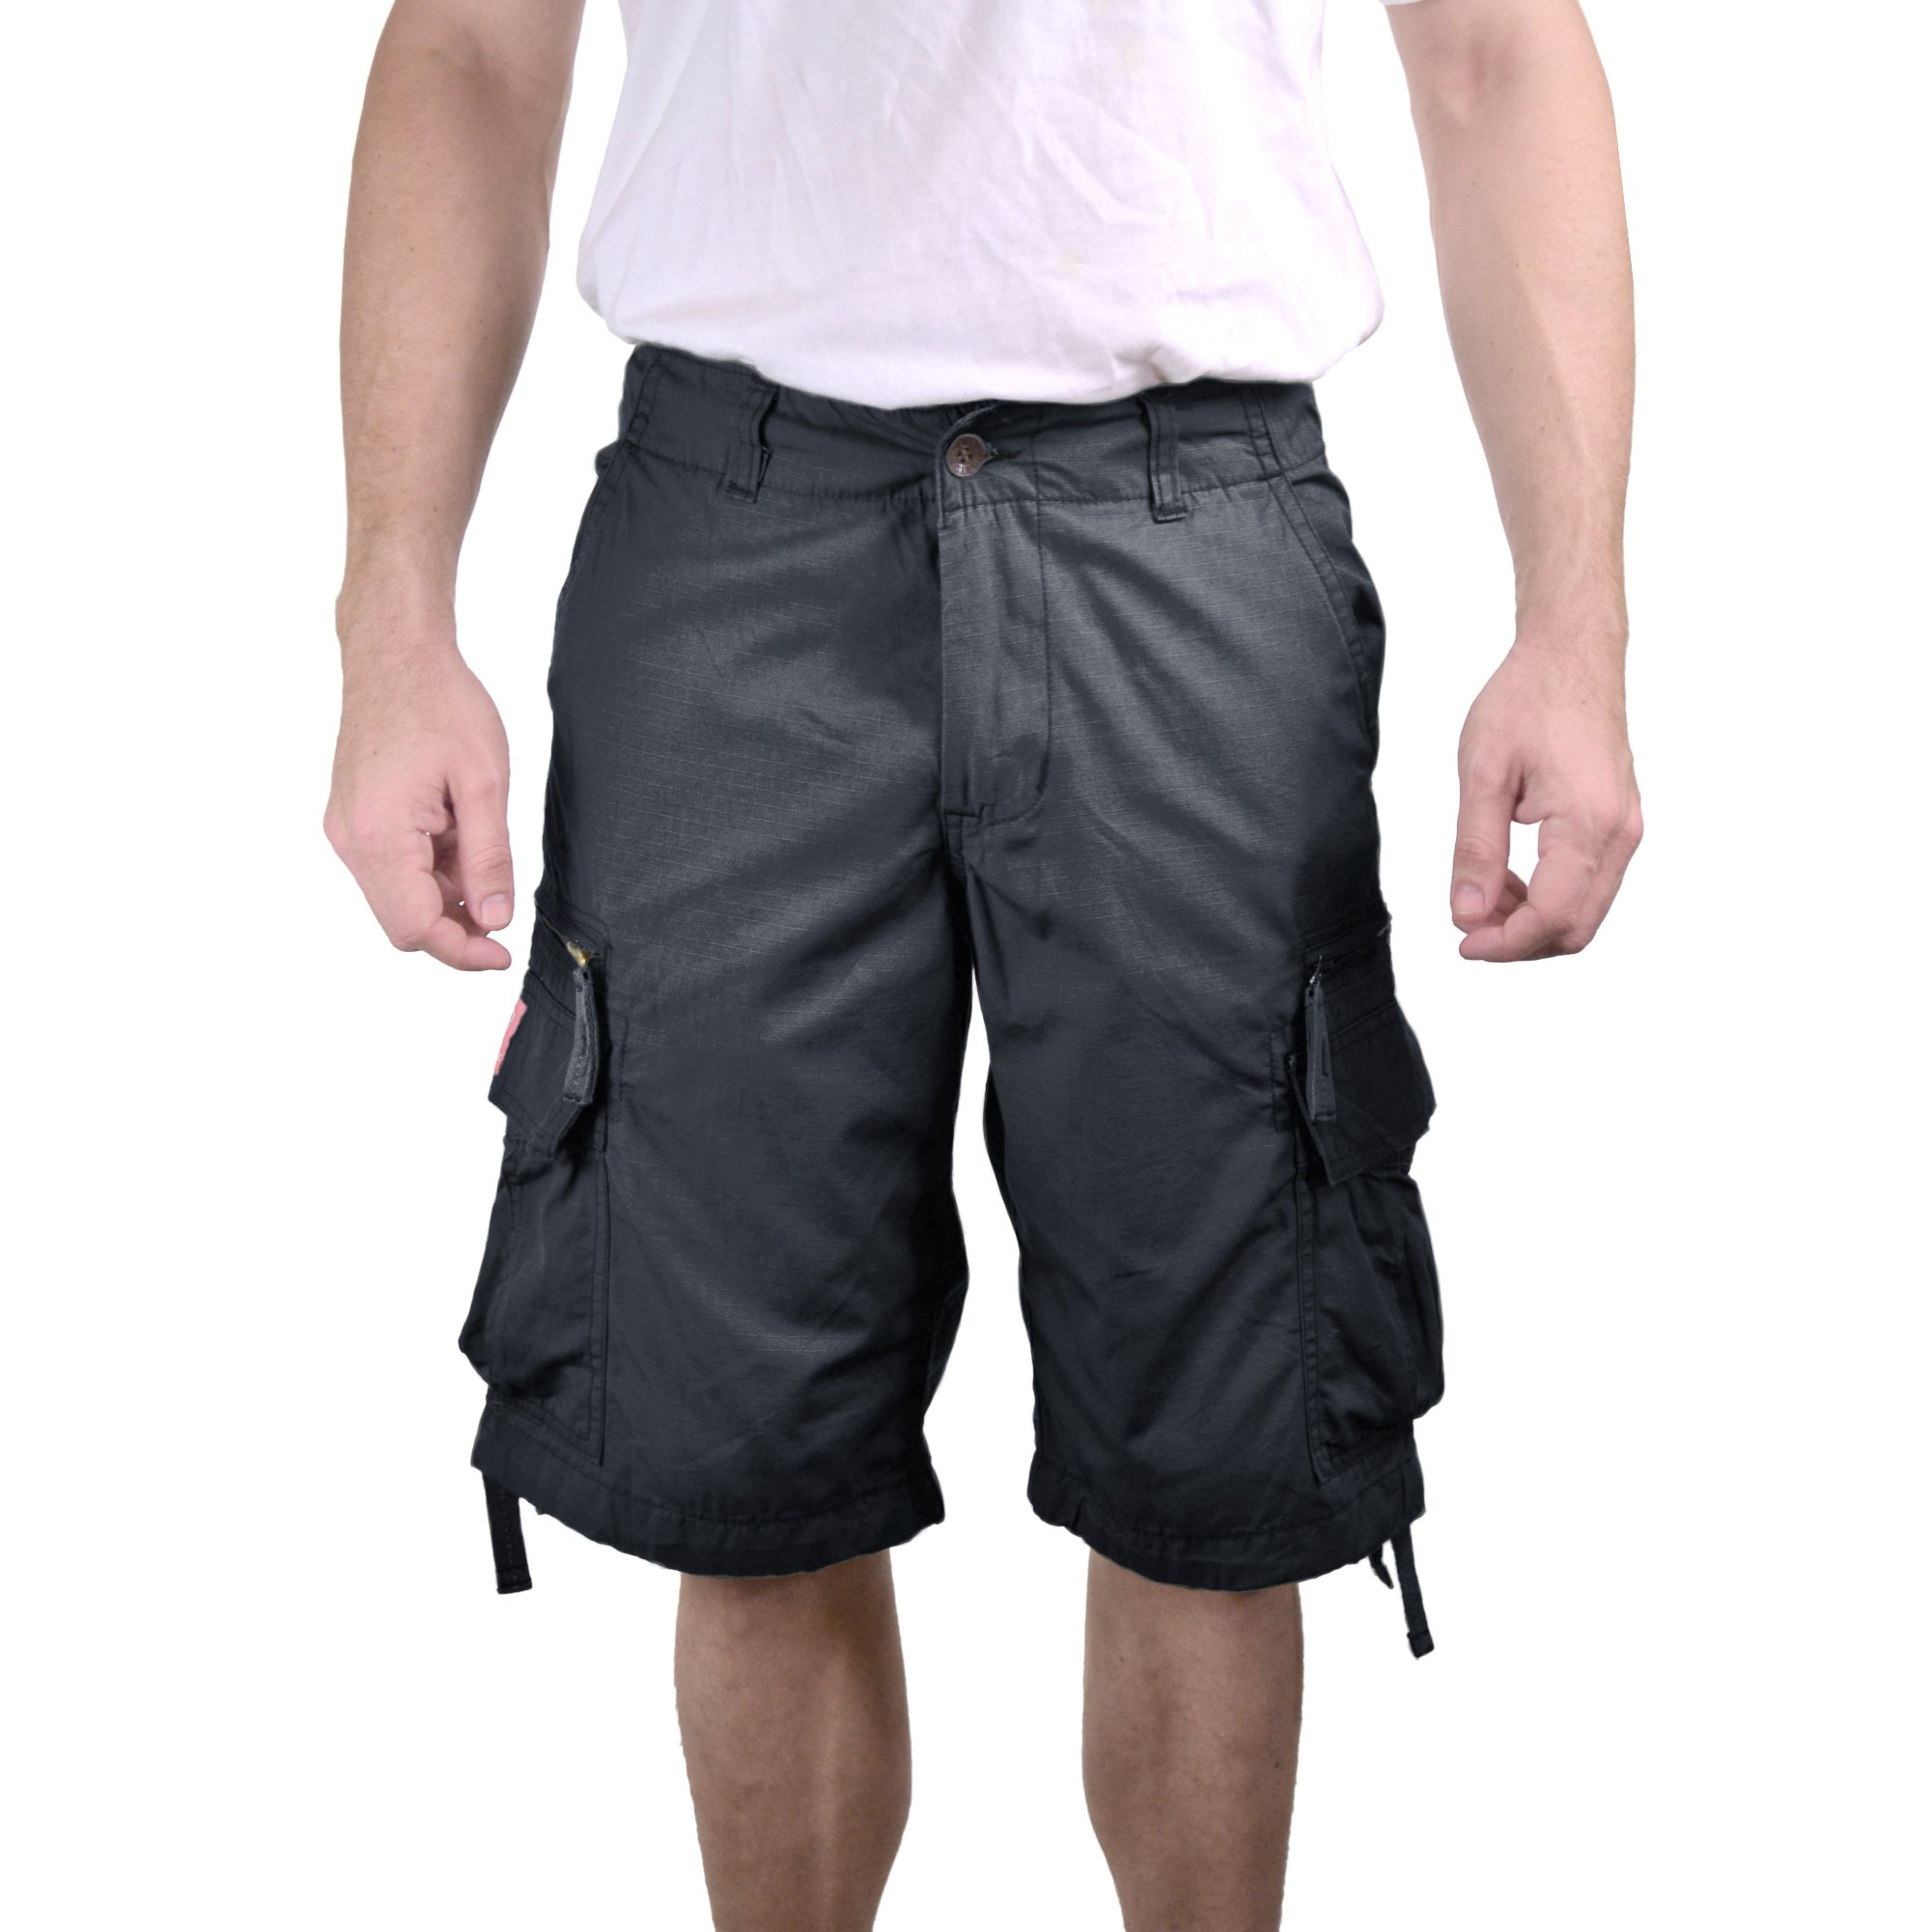 Molecule Men's Zipped Railers Cargo Shorts - Lightweight Cotton, Zipped Pockets | USA 33''/M (Tag L) Coal Black